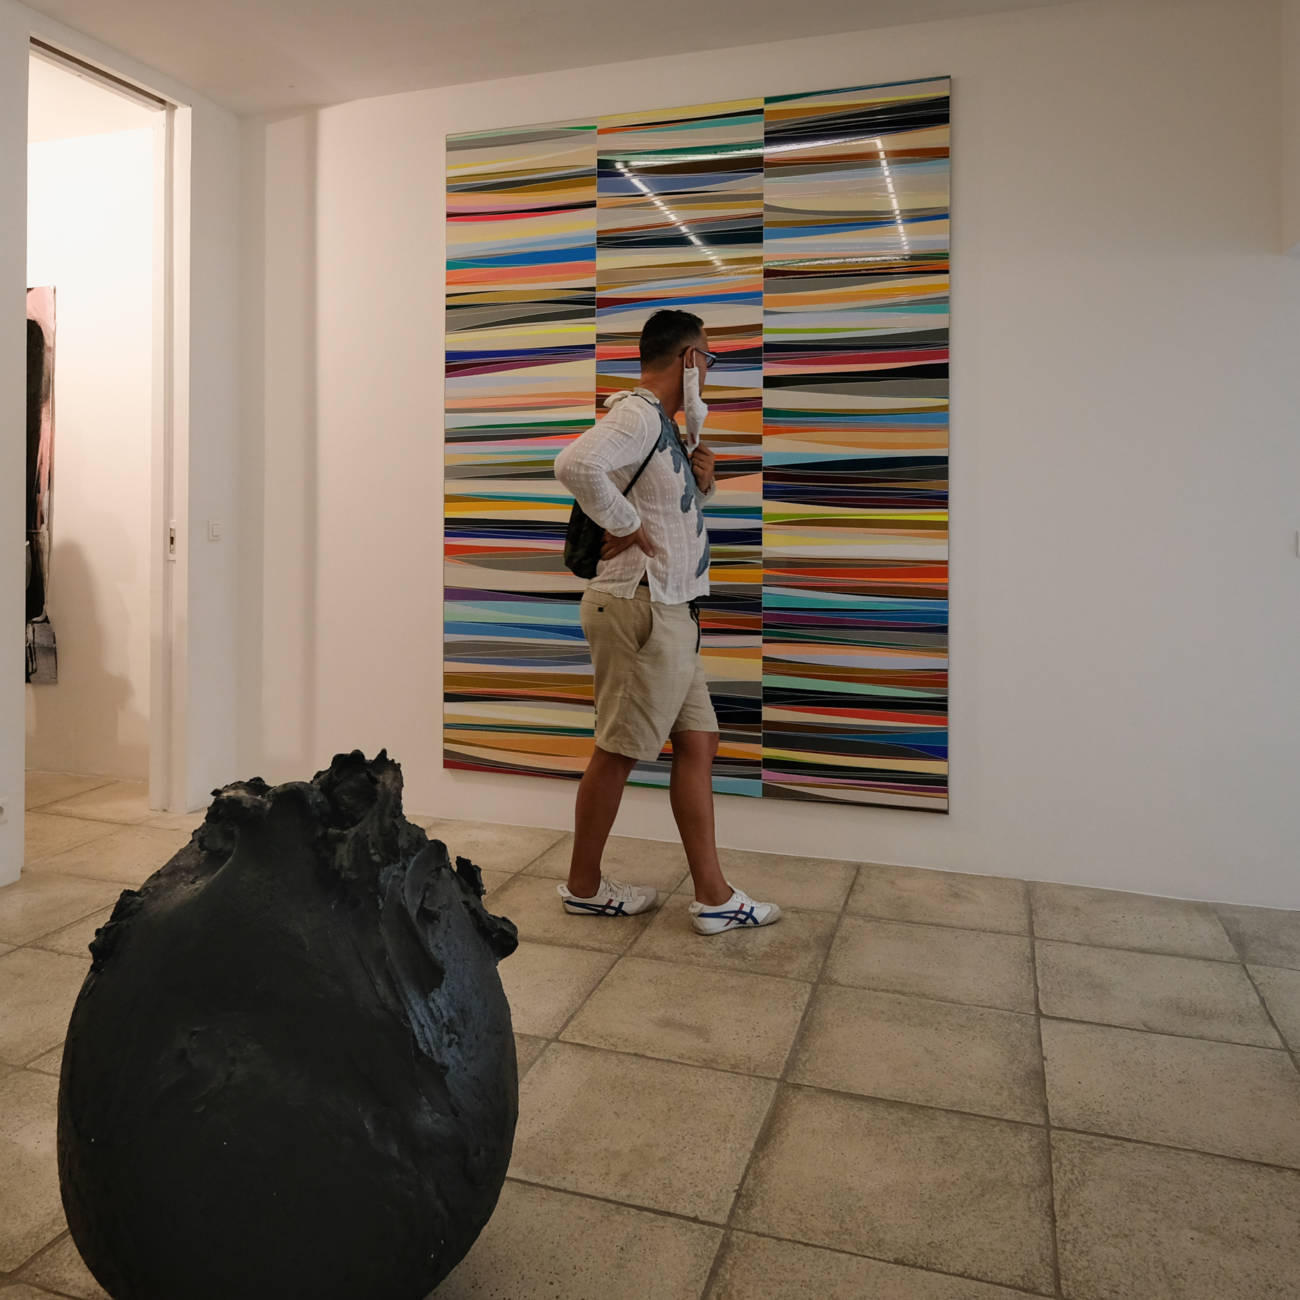 Visite de la galerie par Catherine Issert, directrice © Philippe Pallanti